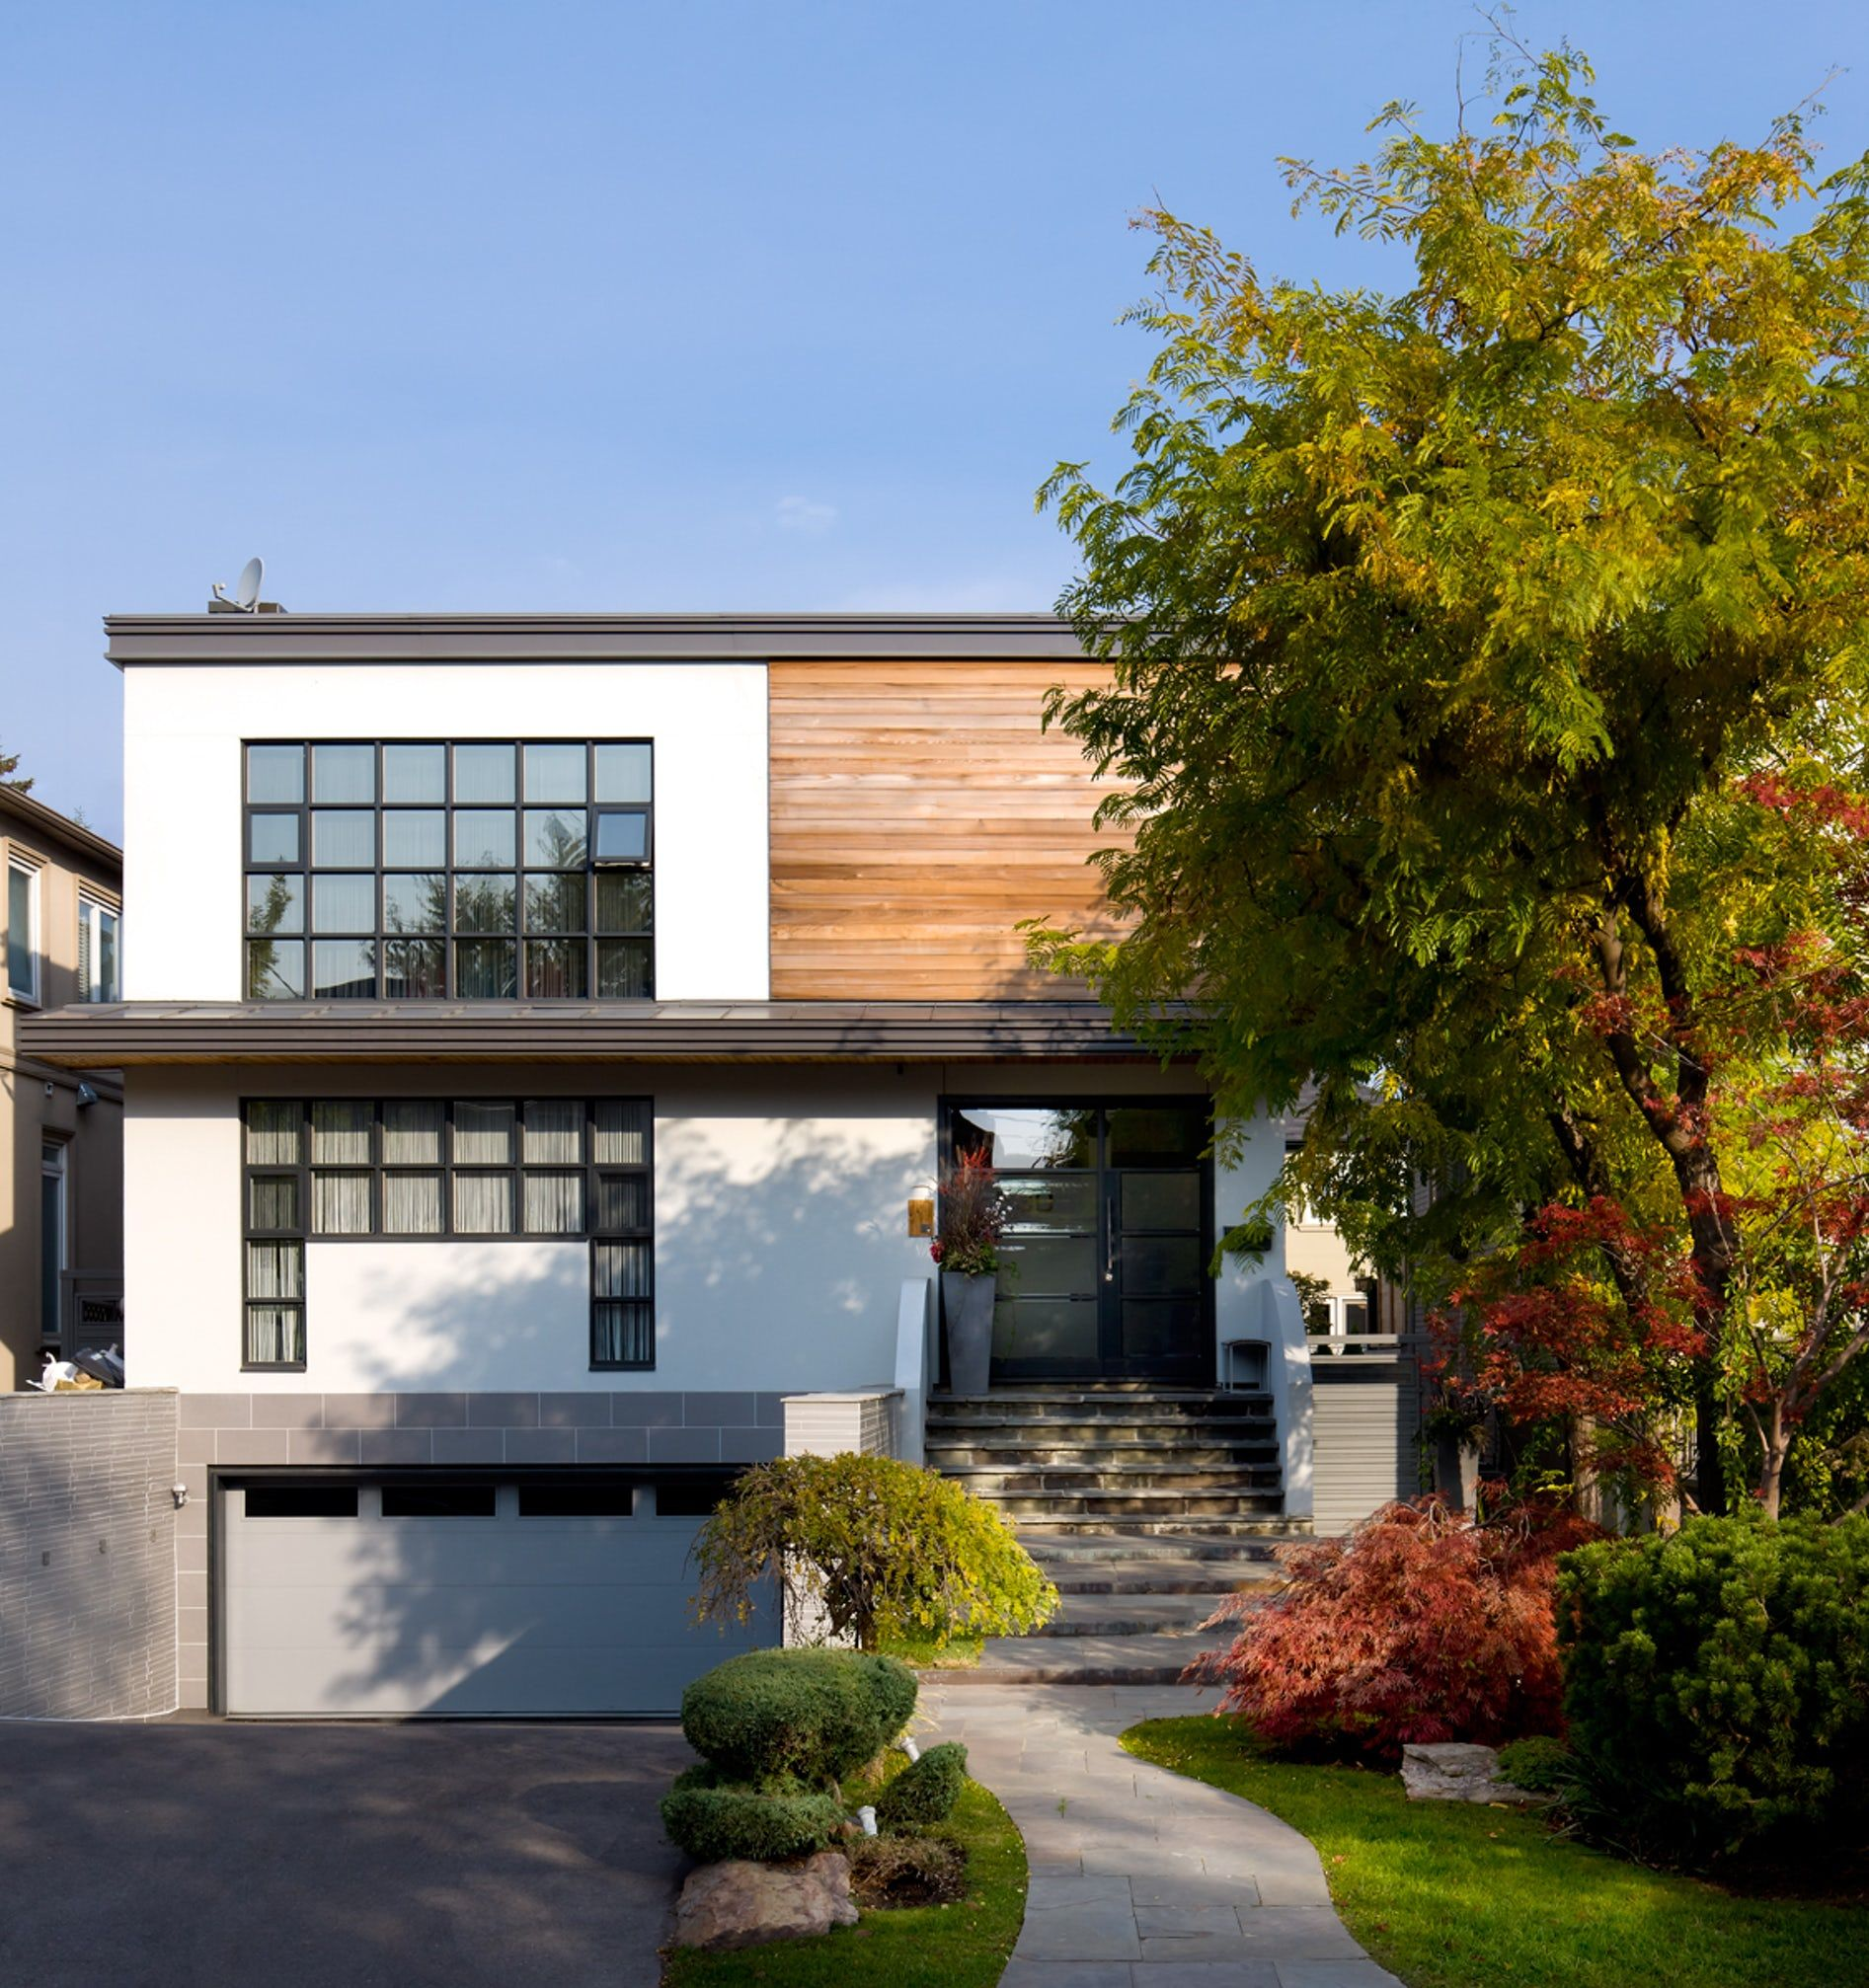 30 stunning modern houses photos of modern exteriorsContemporary House 2019 #3